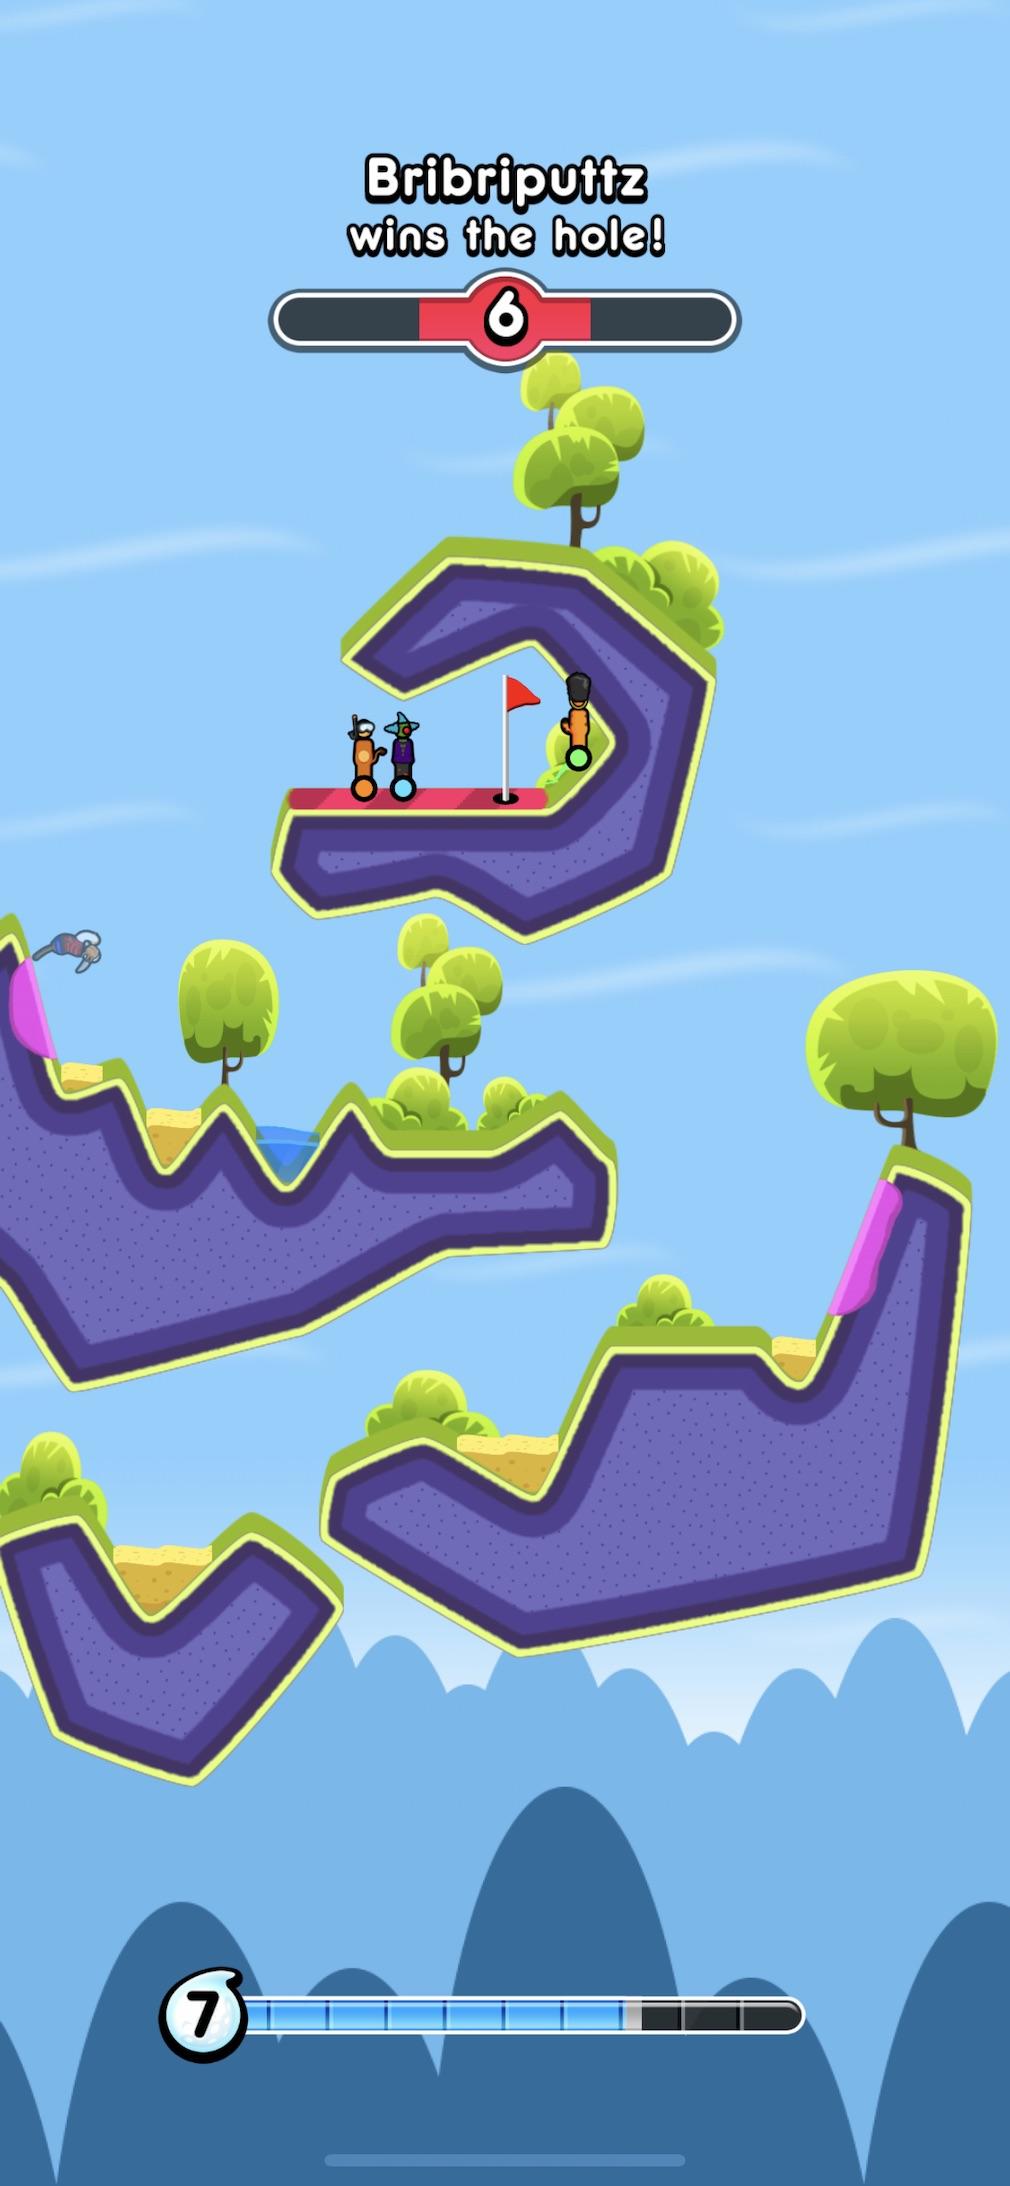 Golf Blitz iOS screenshot - The end of a game